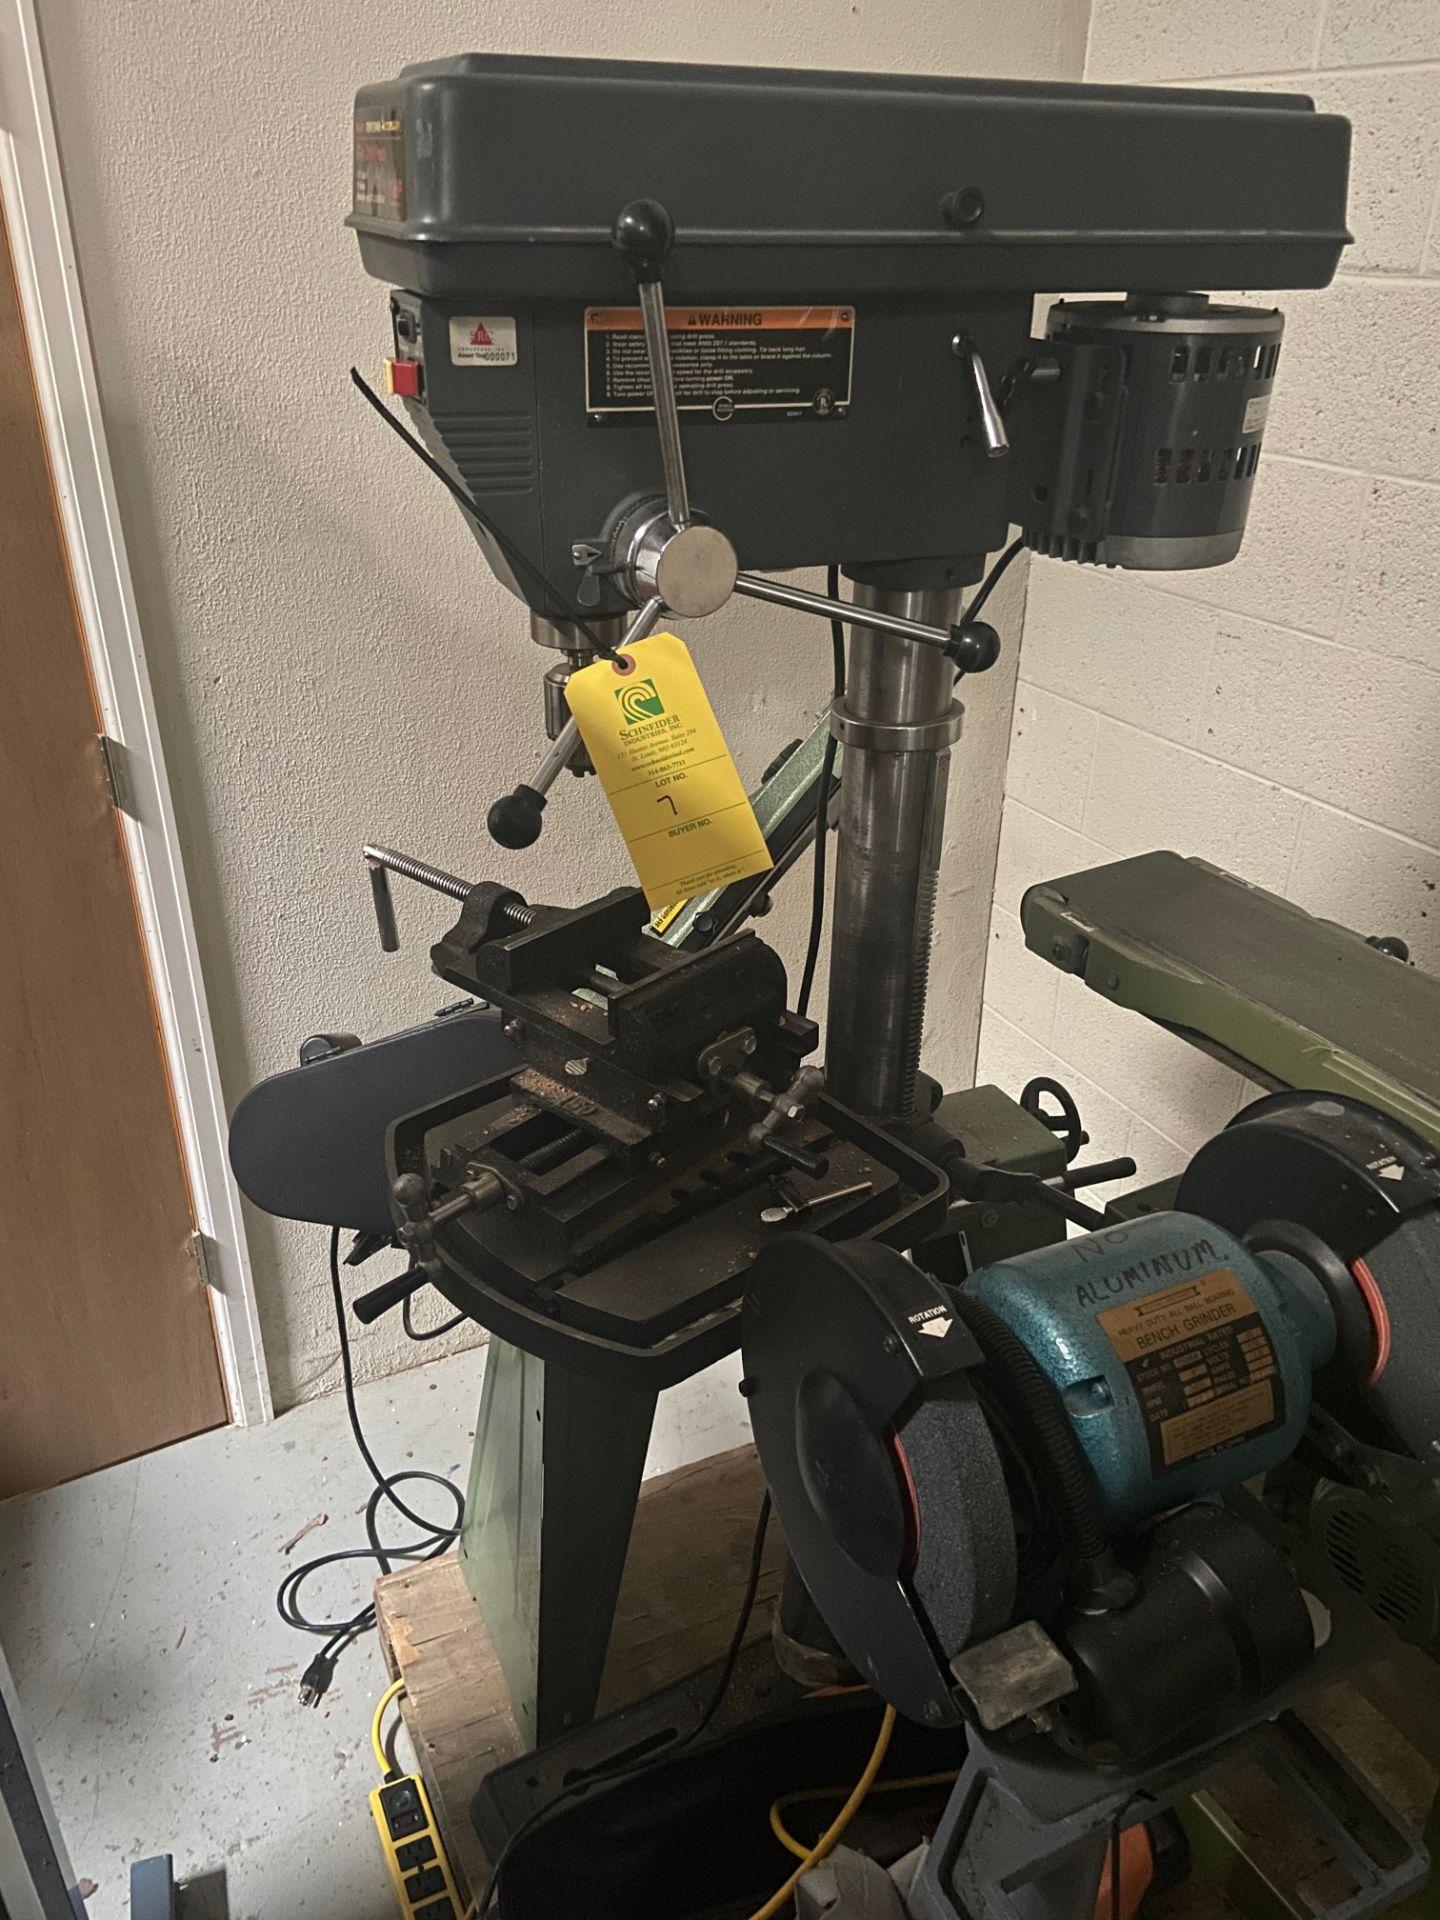 "Sears/Craftsman 17"" Drill Press, 5/8"" Chuck, 200-3630 RPM, Model# 113.213171, Serial# 961870038, - Image 2 of 6"